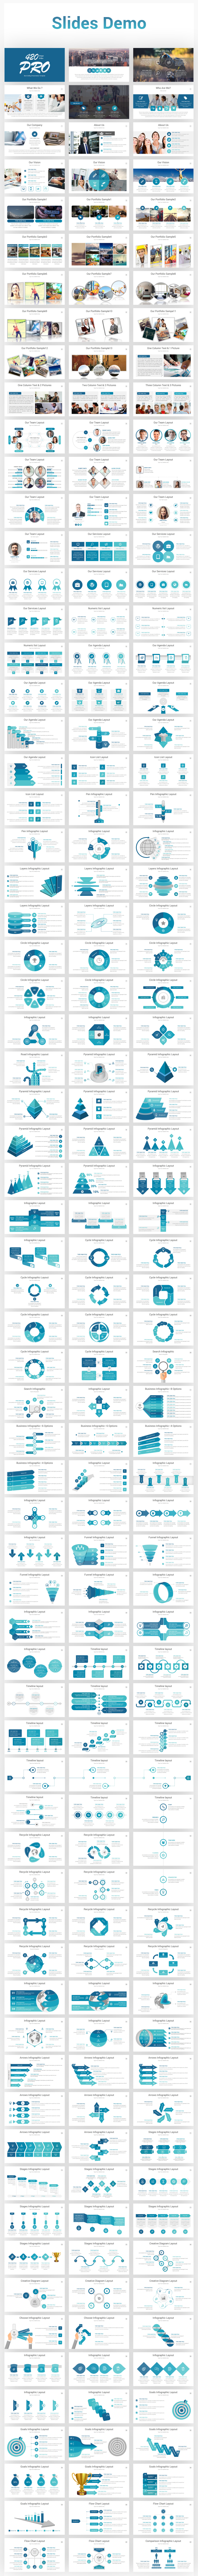 PRO Multipurpose PowerPoint Presentation Template - 2